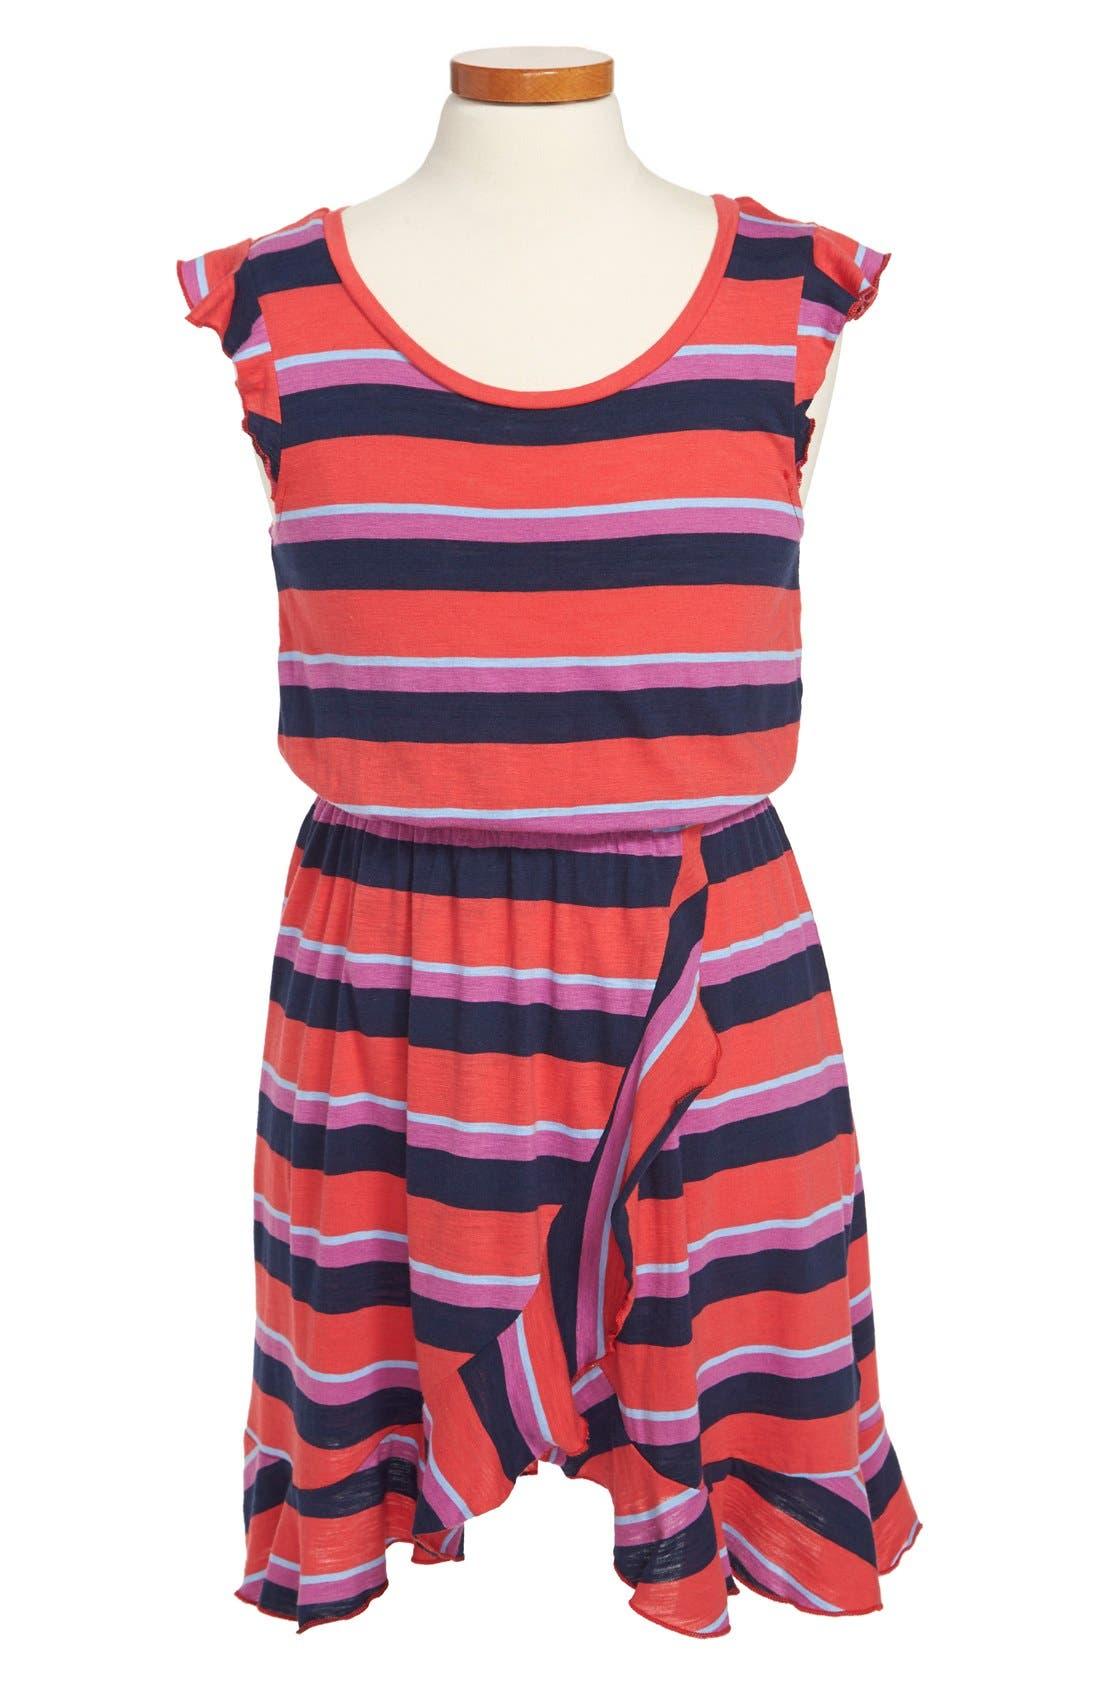 Alternate Image 1 Selected - Splendid 'Wow' Stripe Flutter Sleeve Dress (Big Girls)